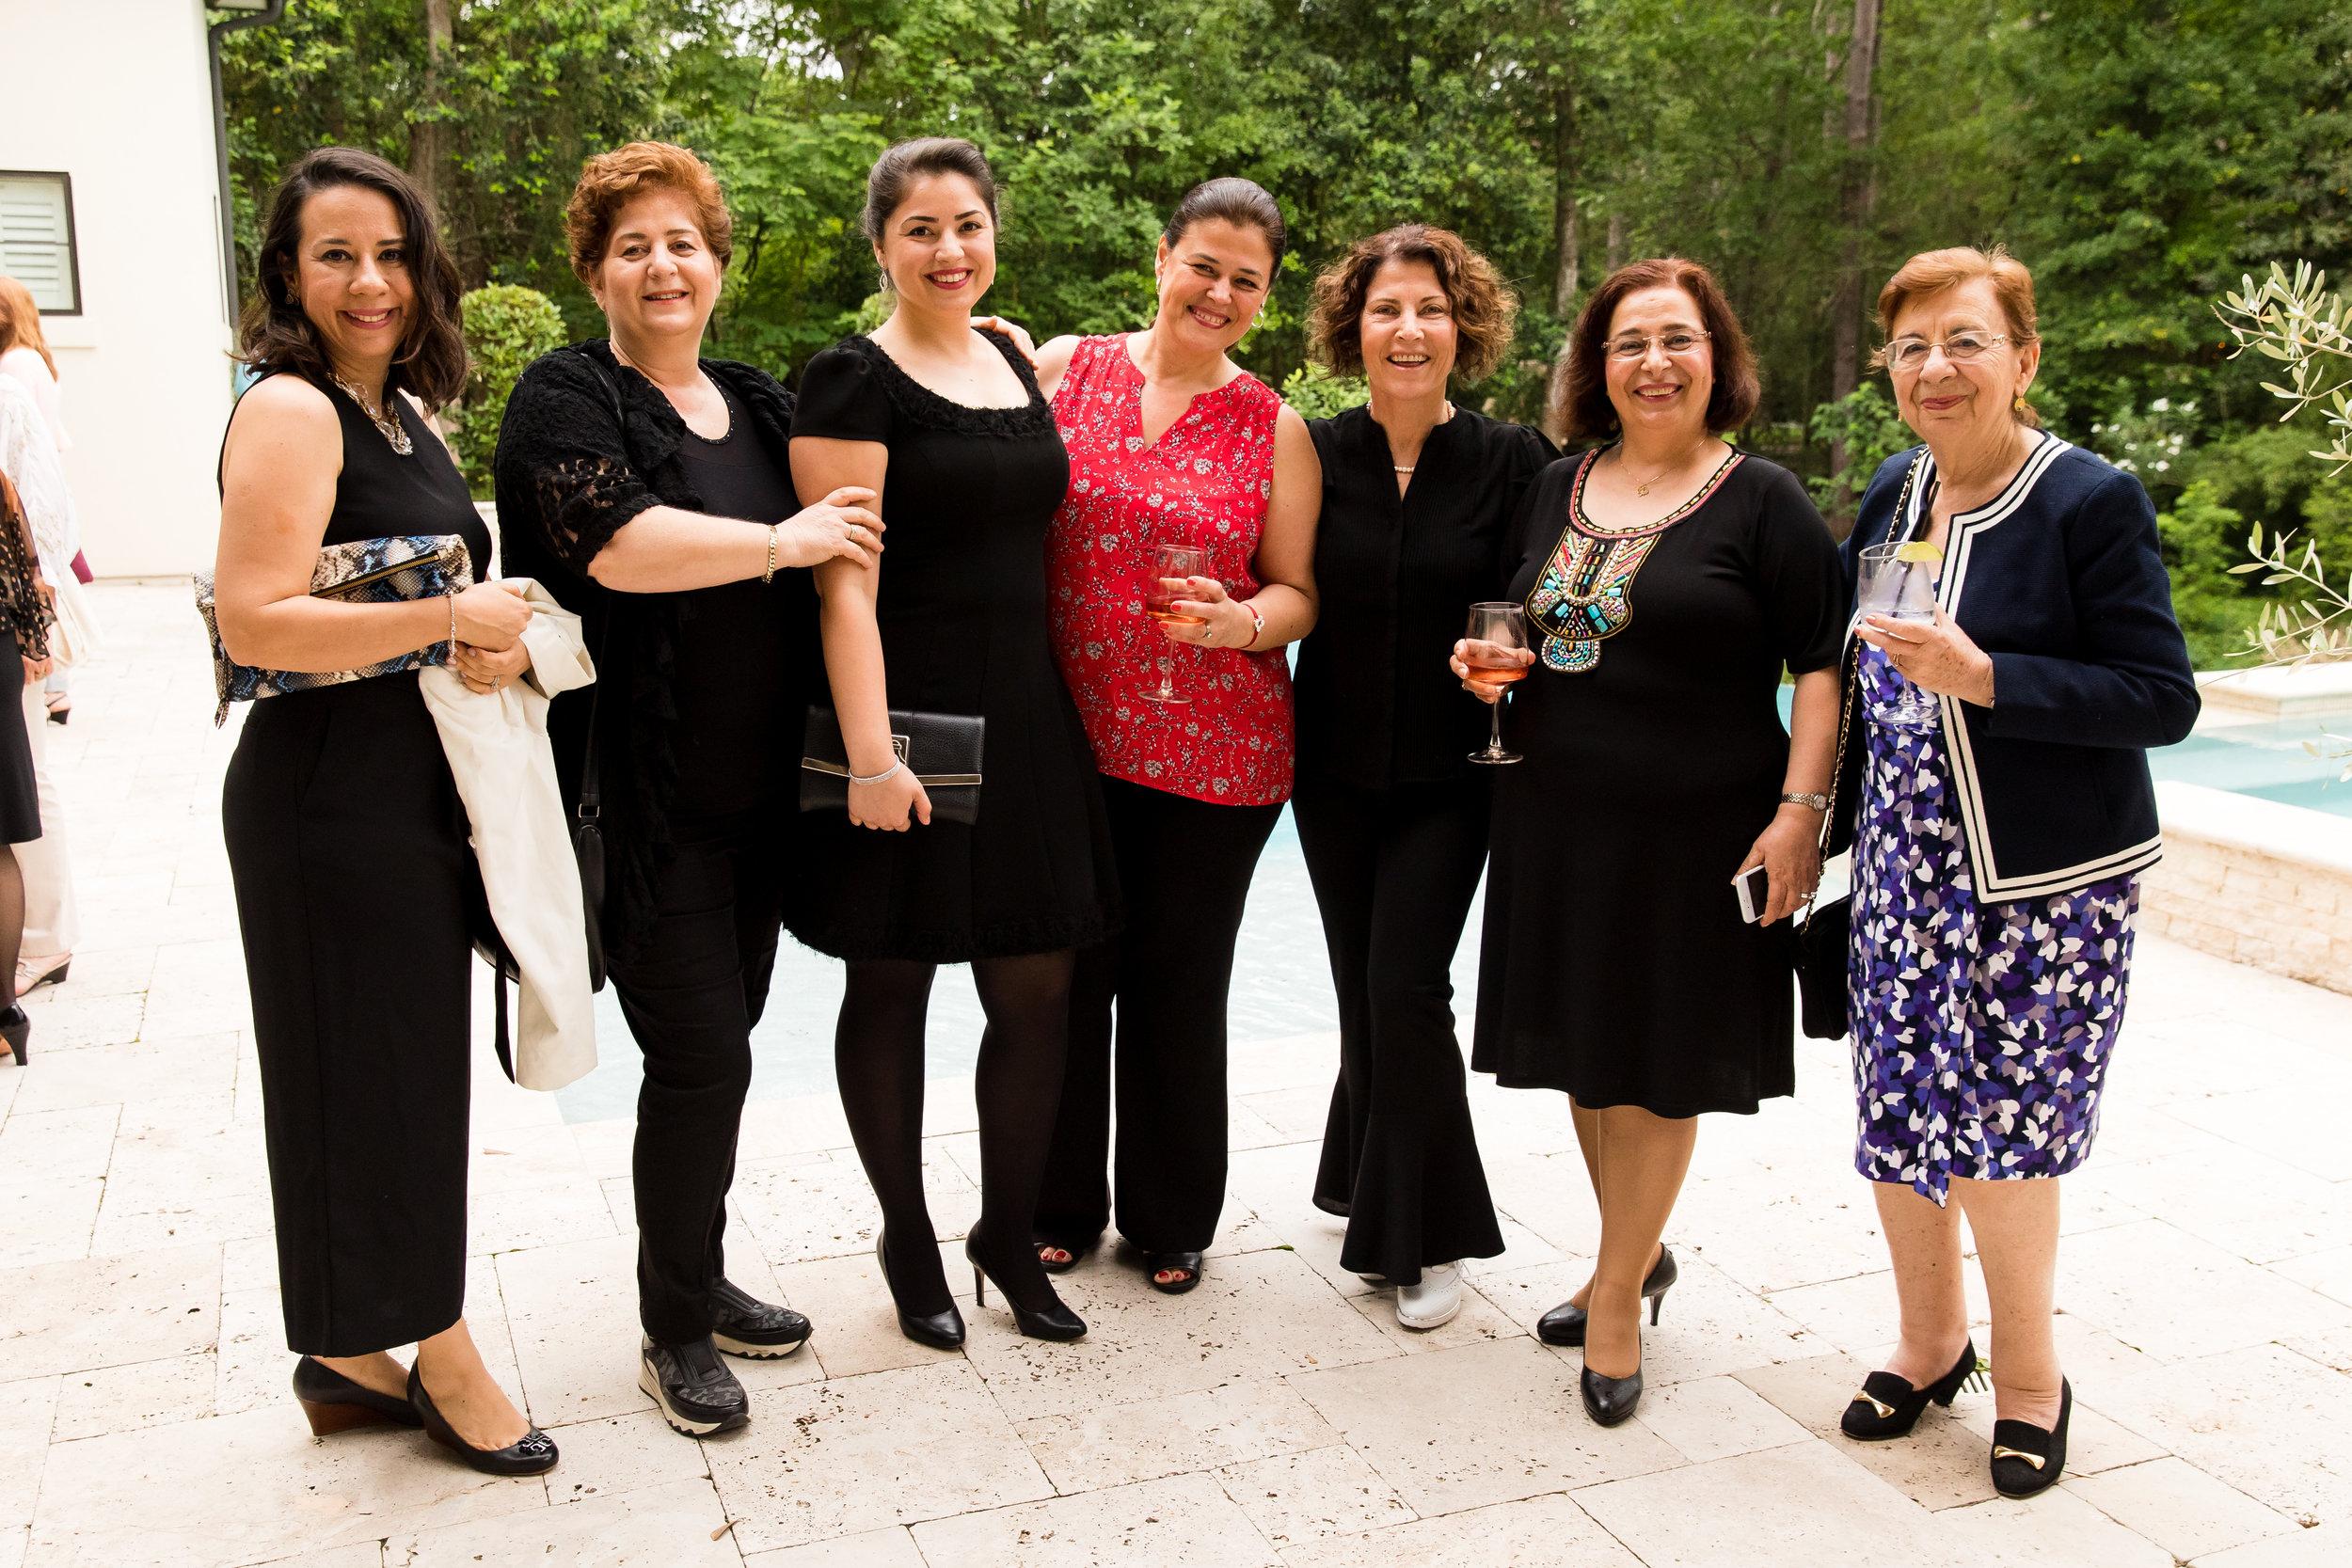 20180421-3rd Annual Education Women Turkey-162.jpg